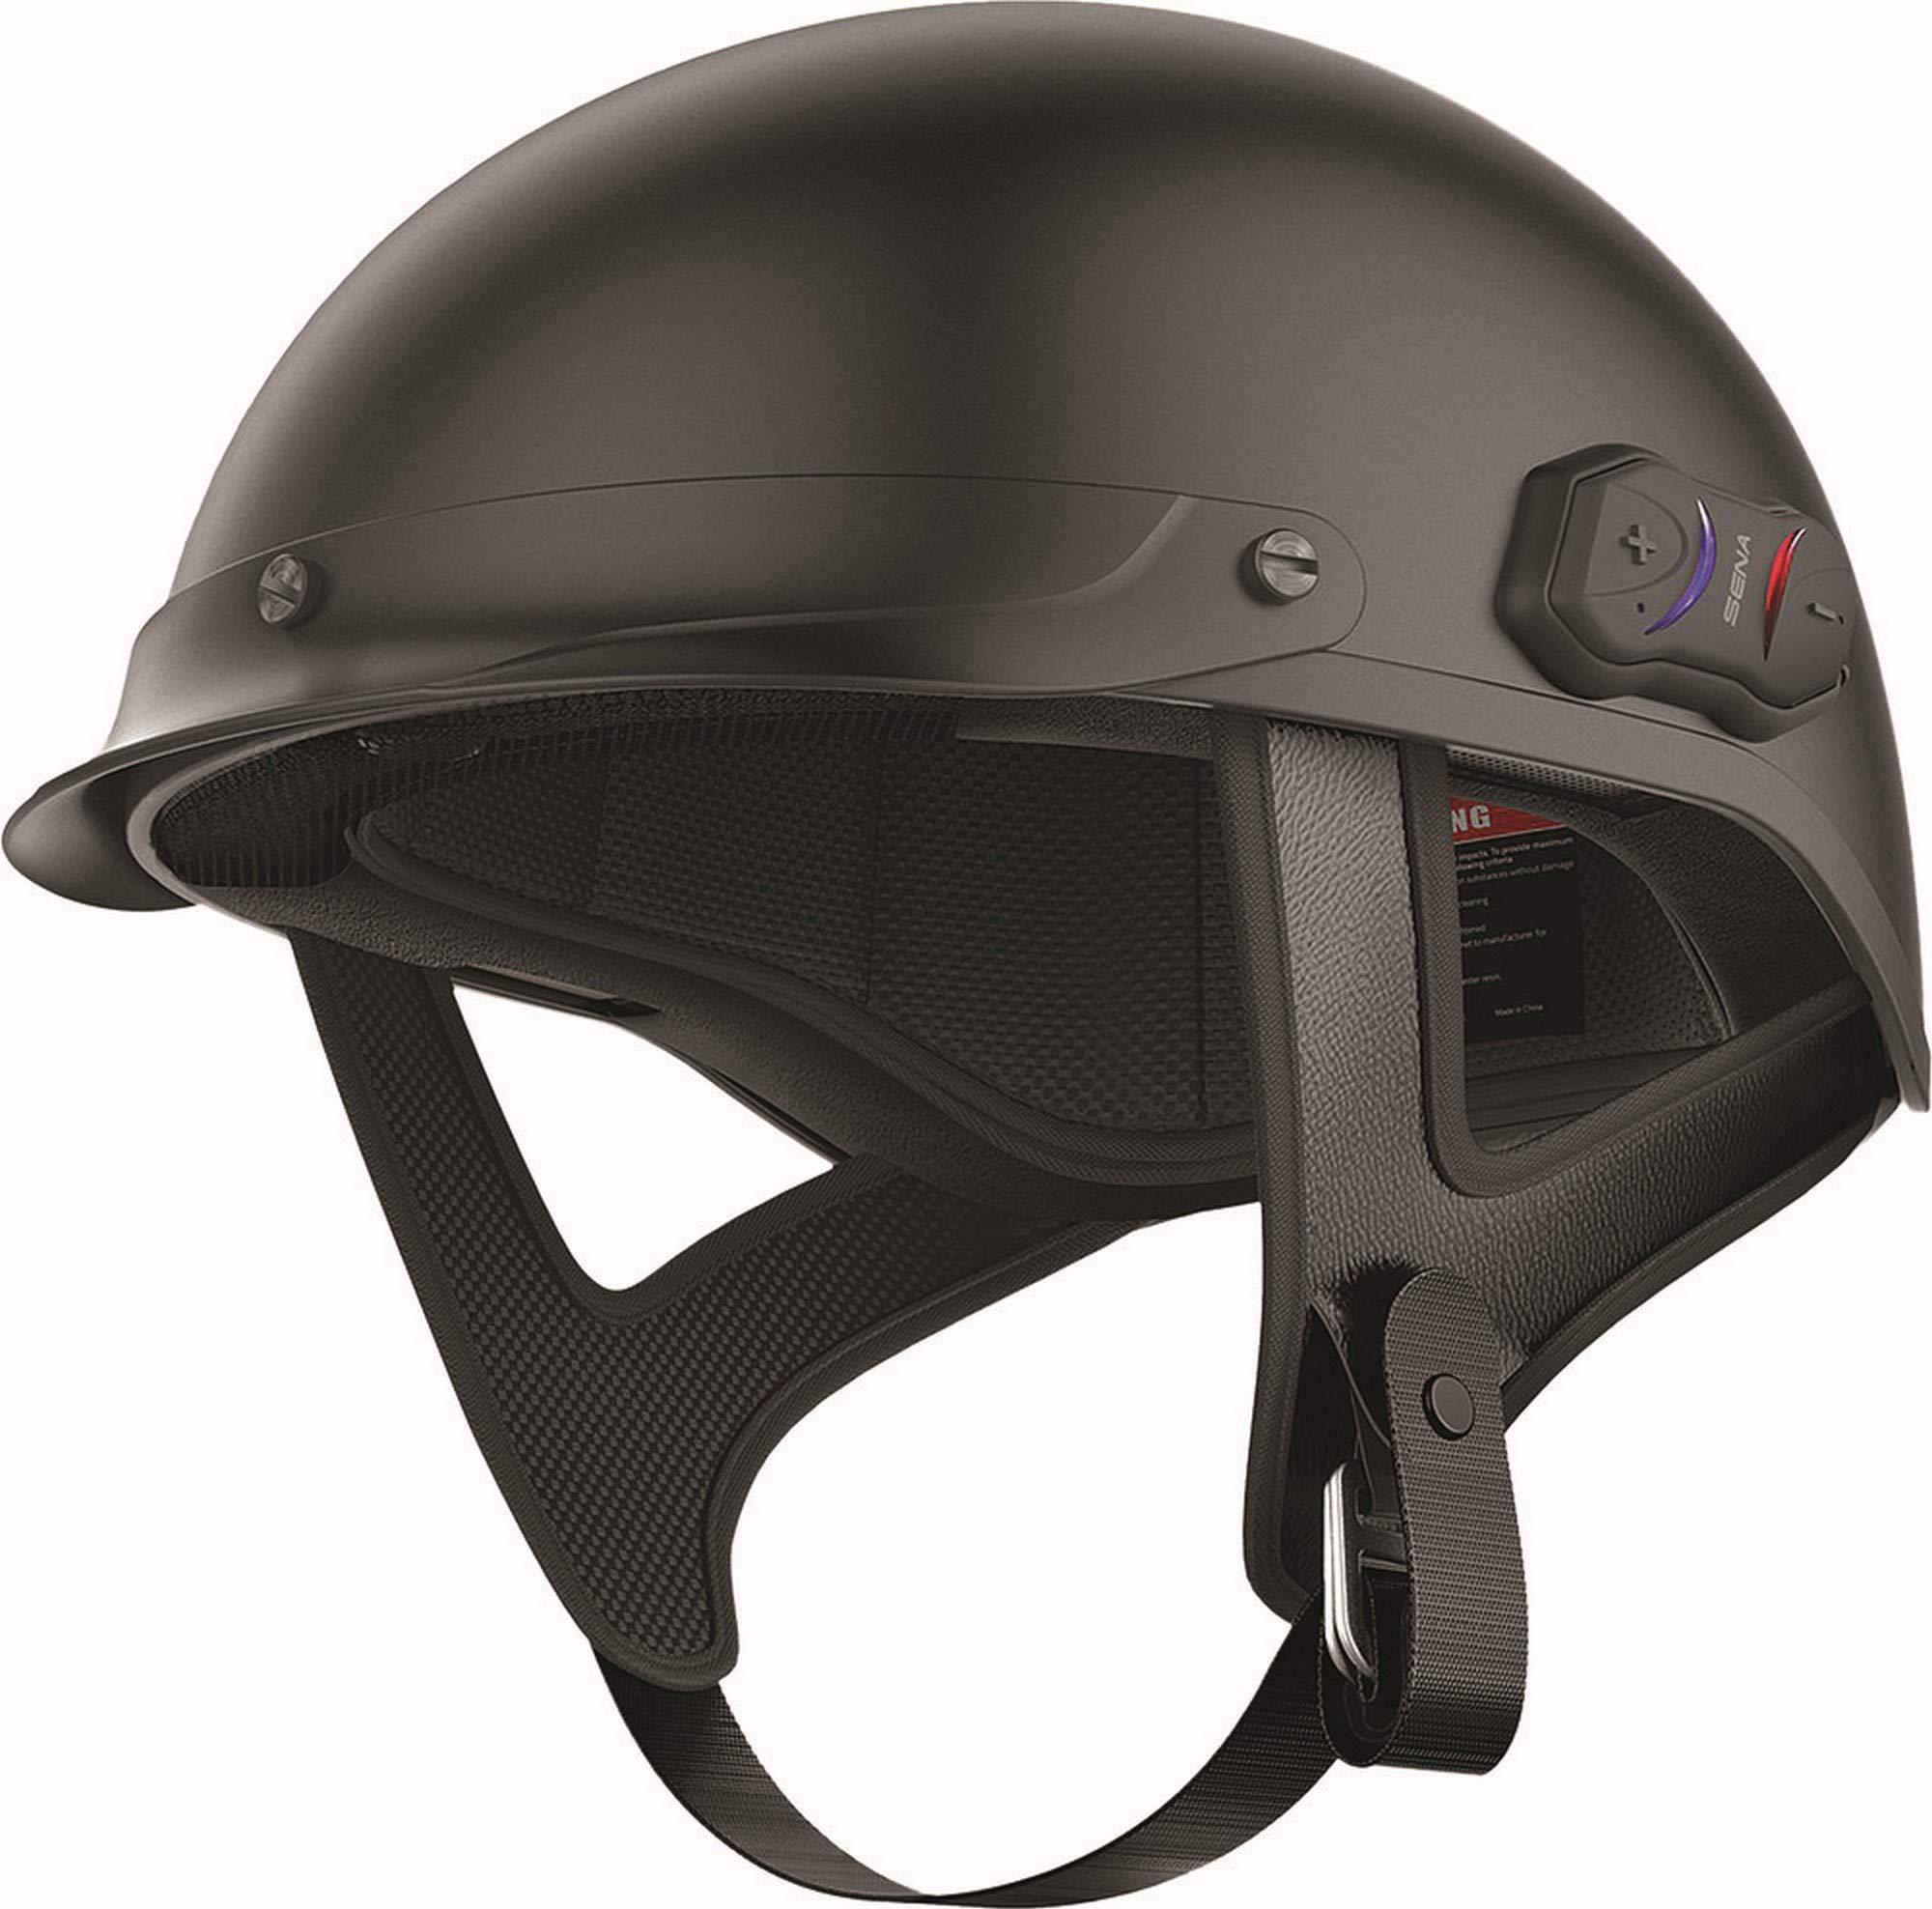 Sena Cavalry Bluetooth Motorcyle Helmets